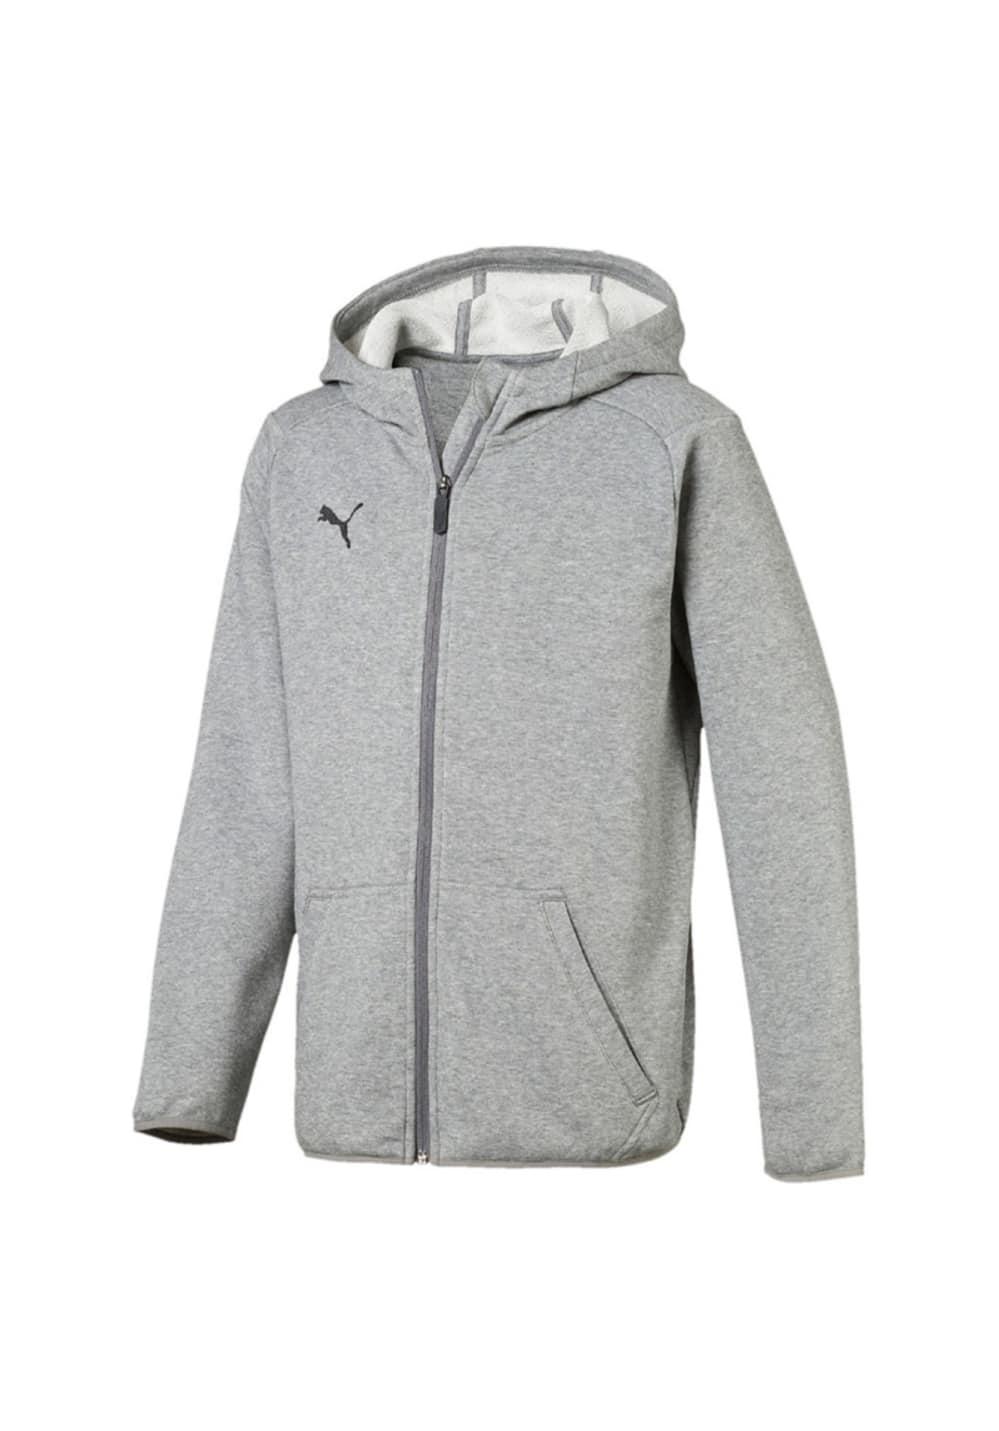 Puma Liga Casual Long Sleeve Hoody Jacket Jr - Running jackets ... 0e97a7cb76